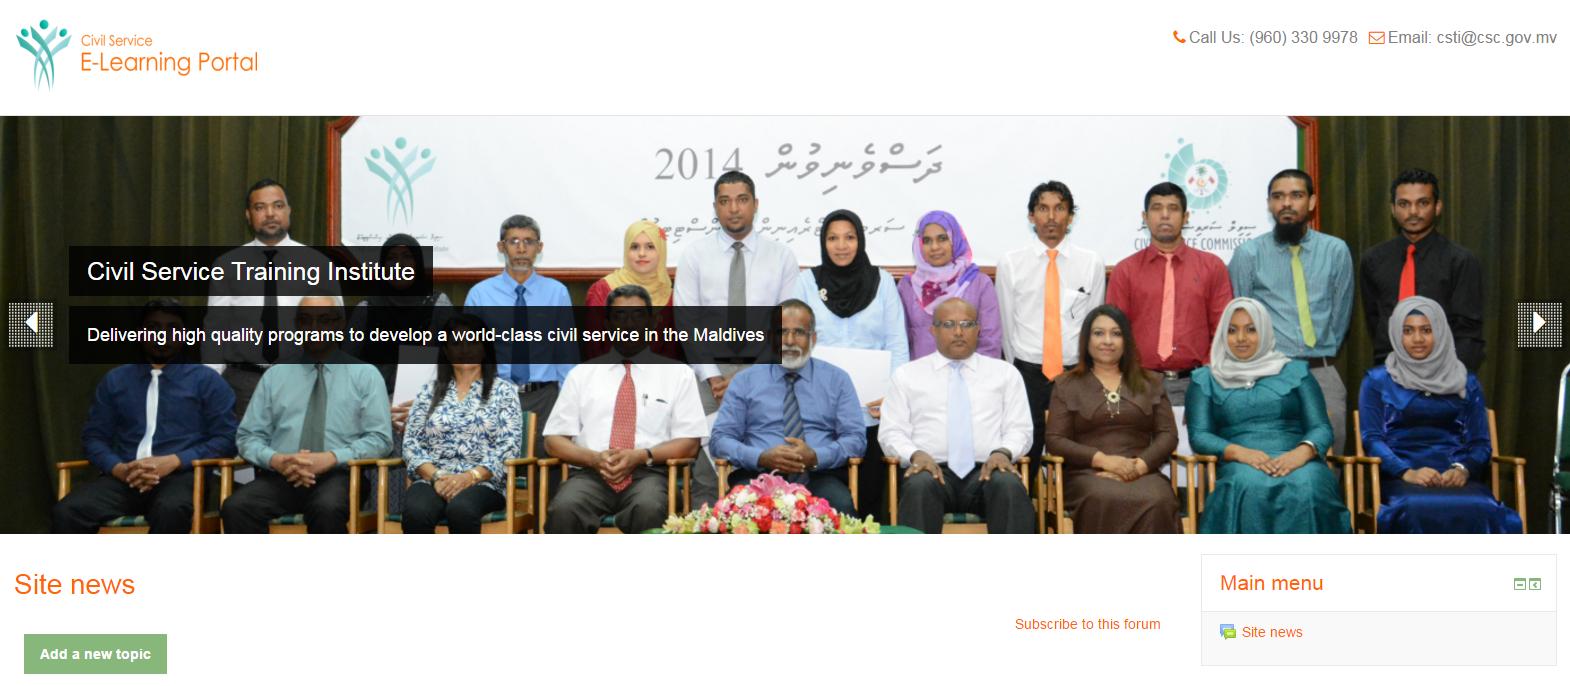 Civil Service Training Institute Maldives | Public